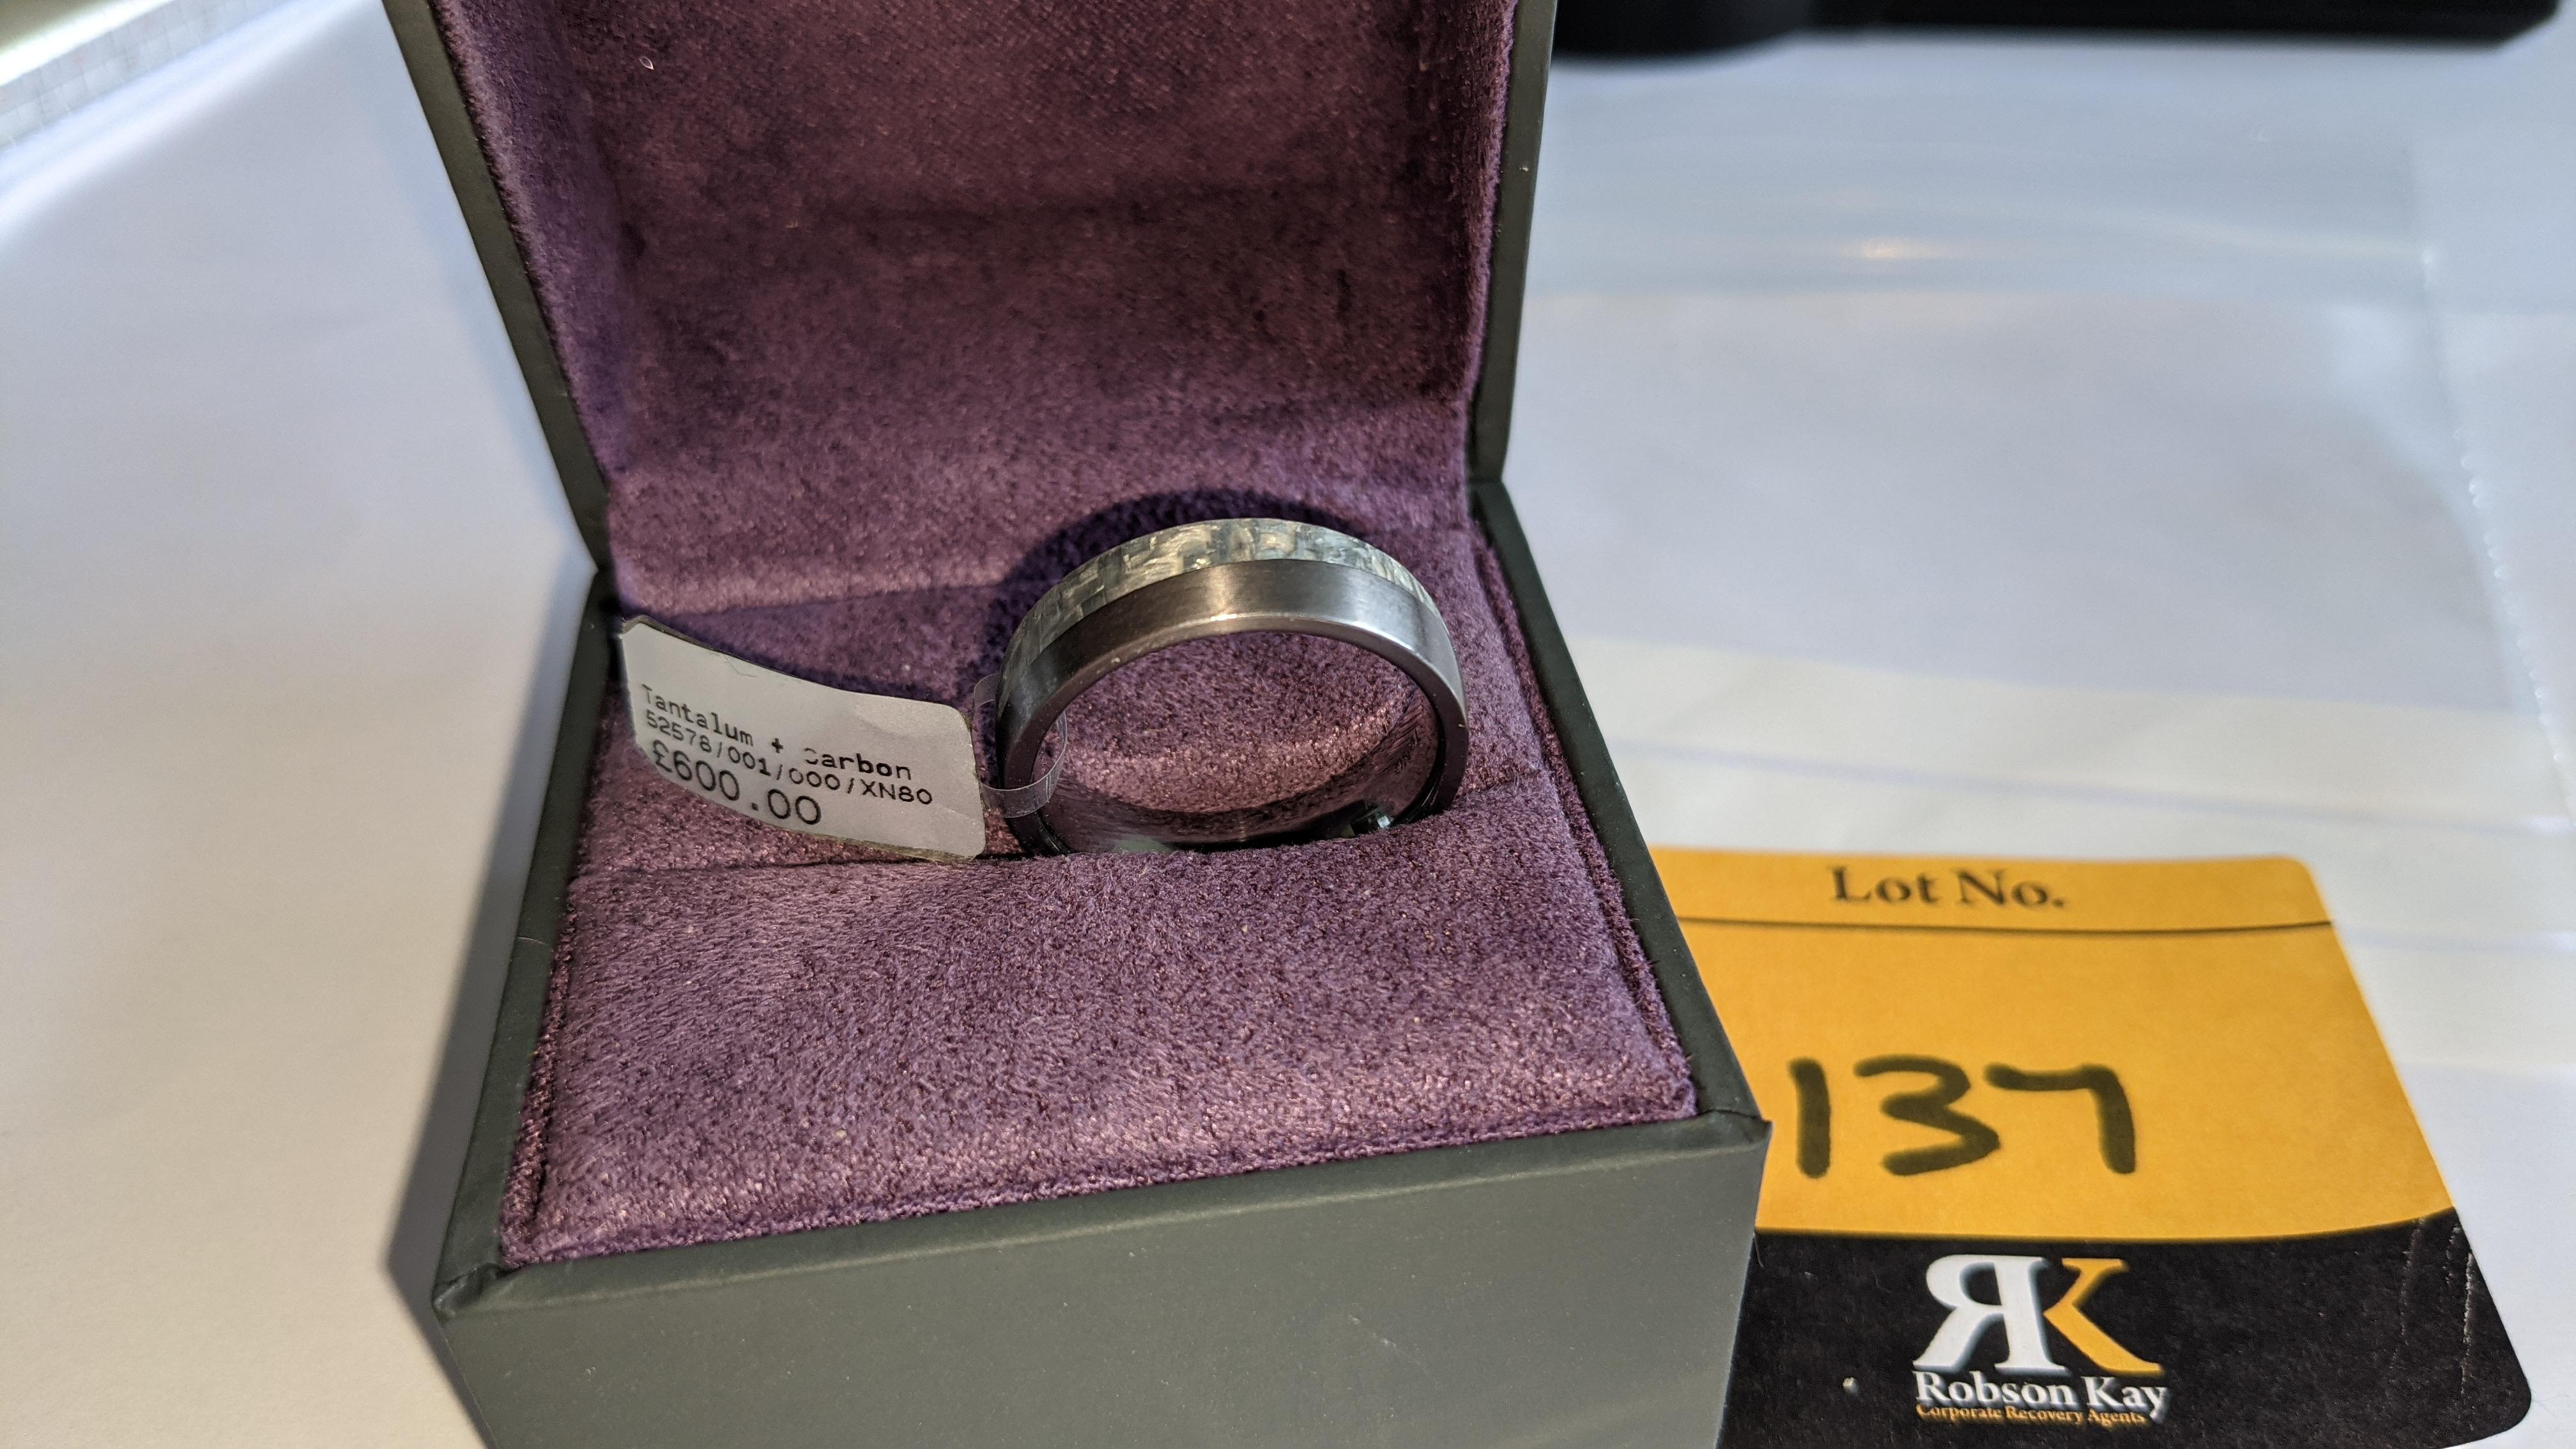 Tantalum & carbon ring RRP £600 - Image 13 of 13